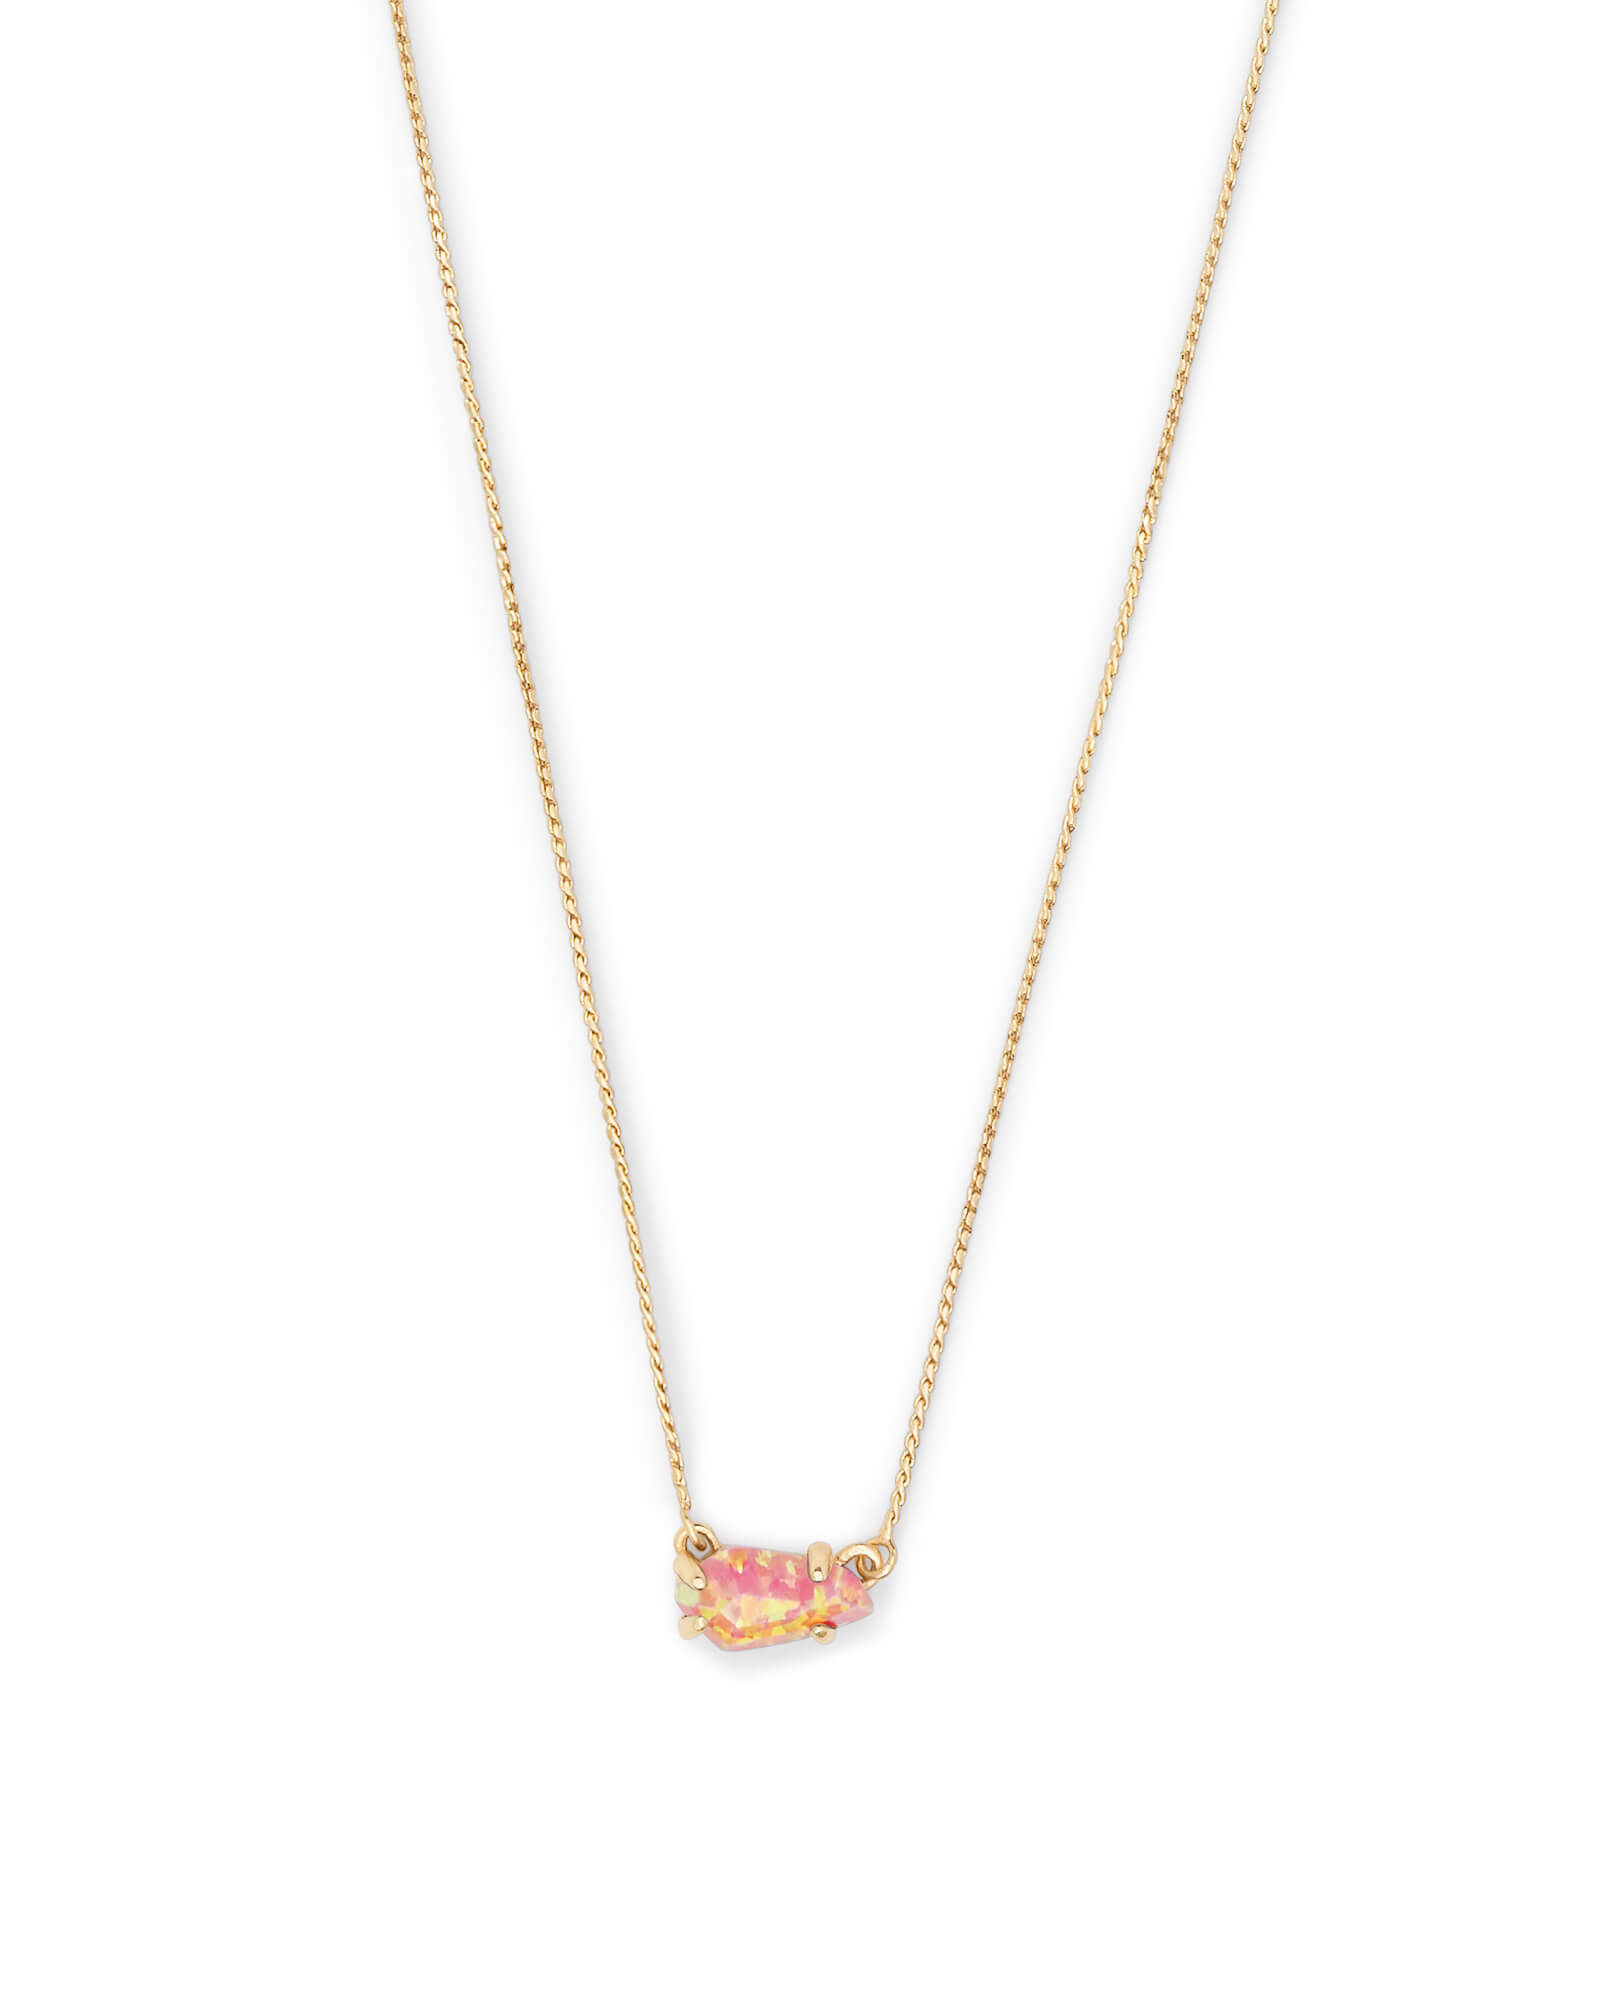 Jayde Gold Pendant Necklace In Magenta Kyocera Opal by Kendra Scott